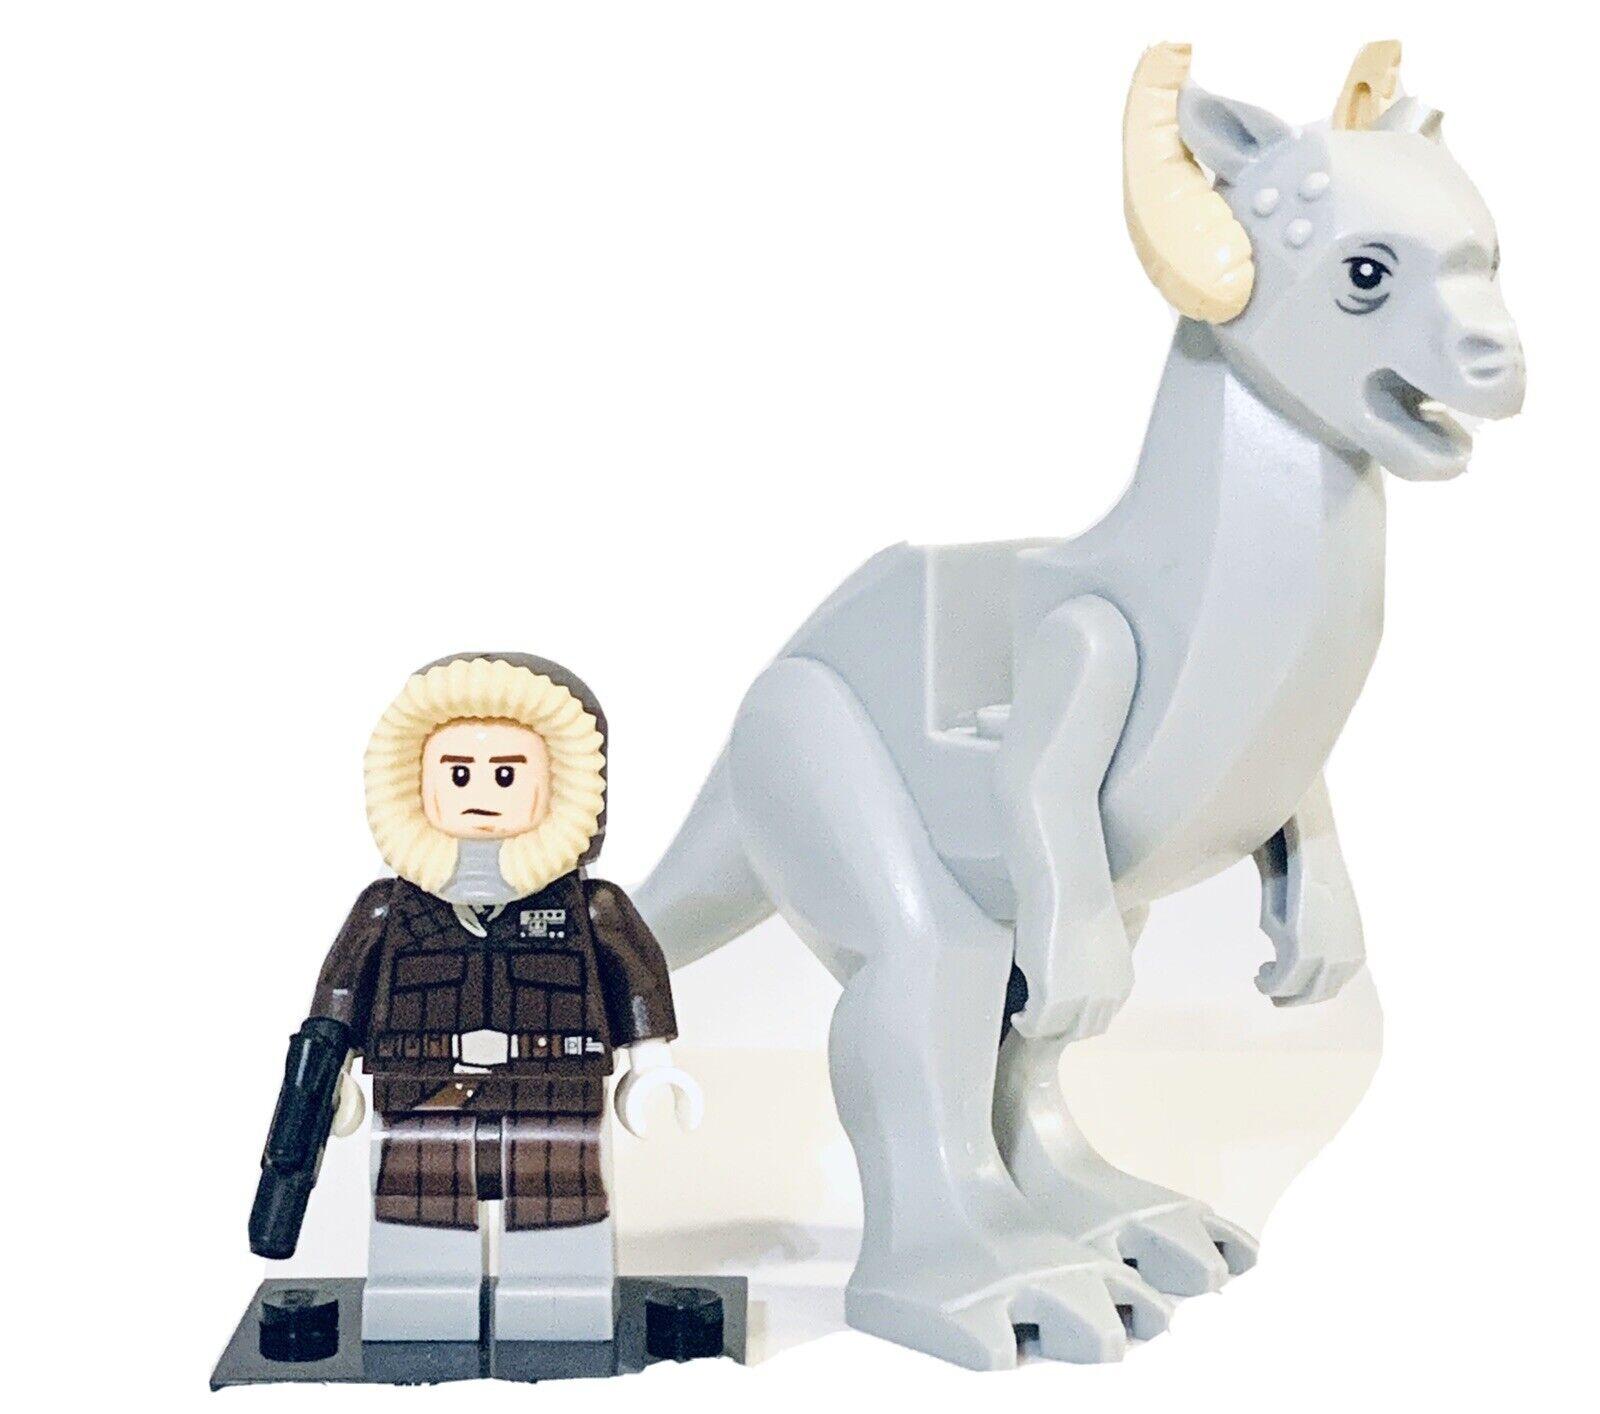 Hoth Han Solo GENUINE LEGO STAR WARS MINIFIGURES